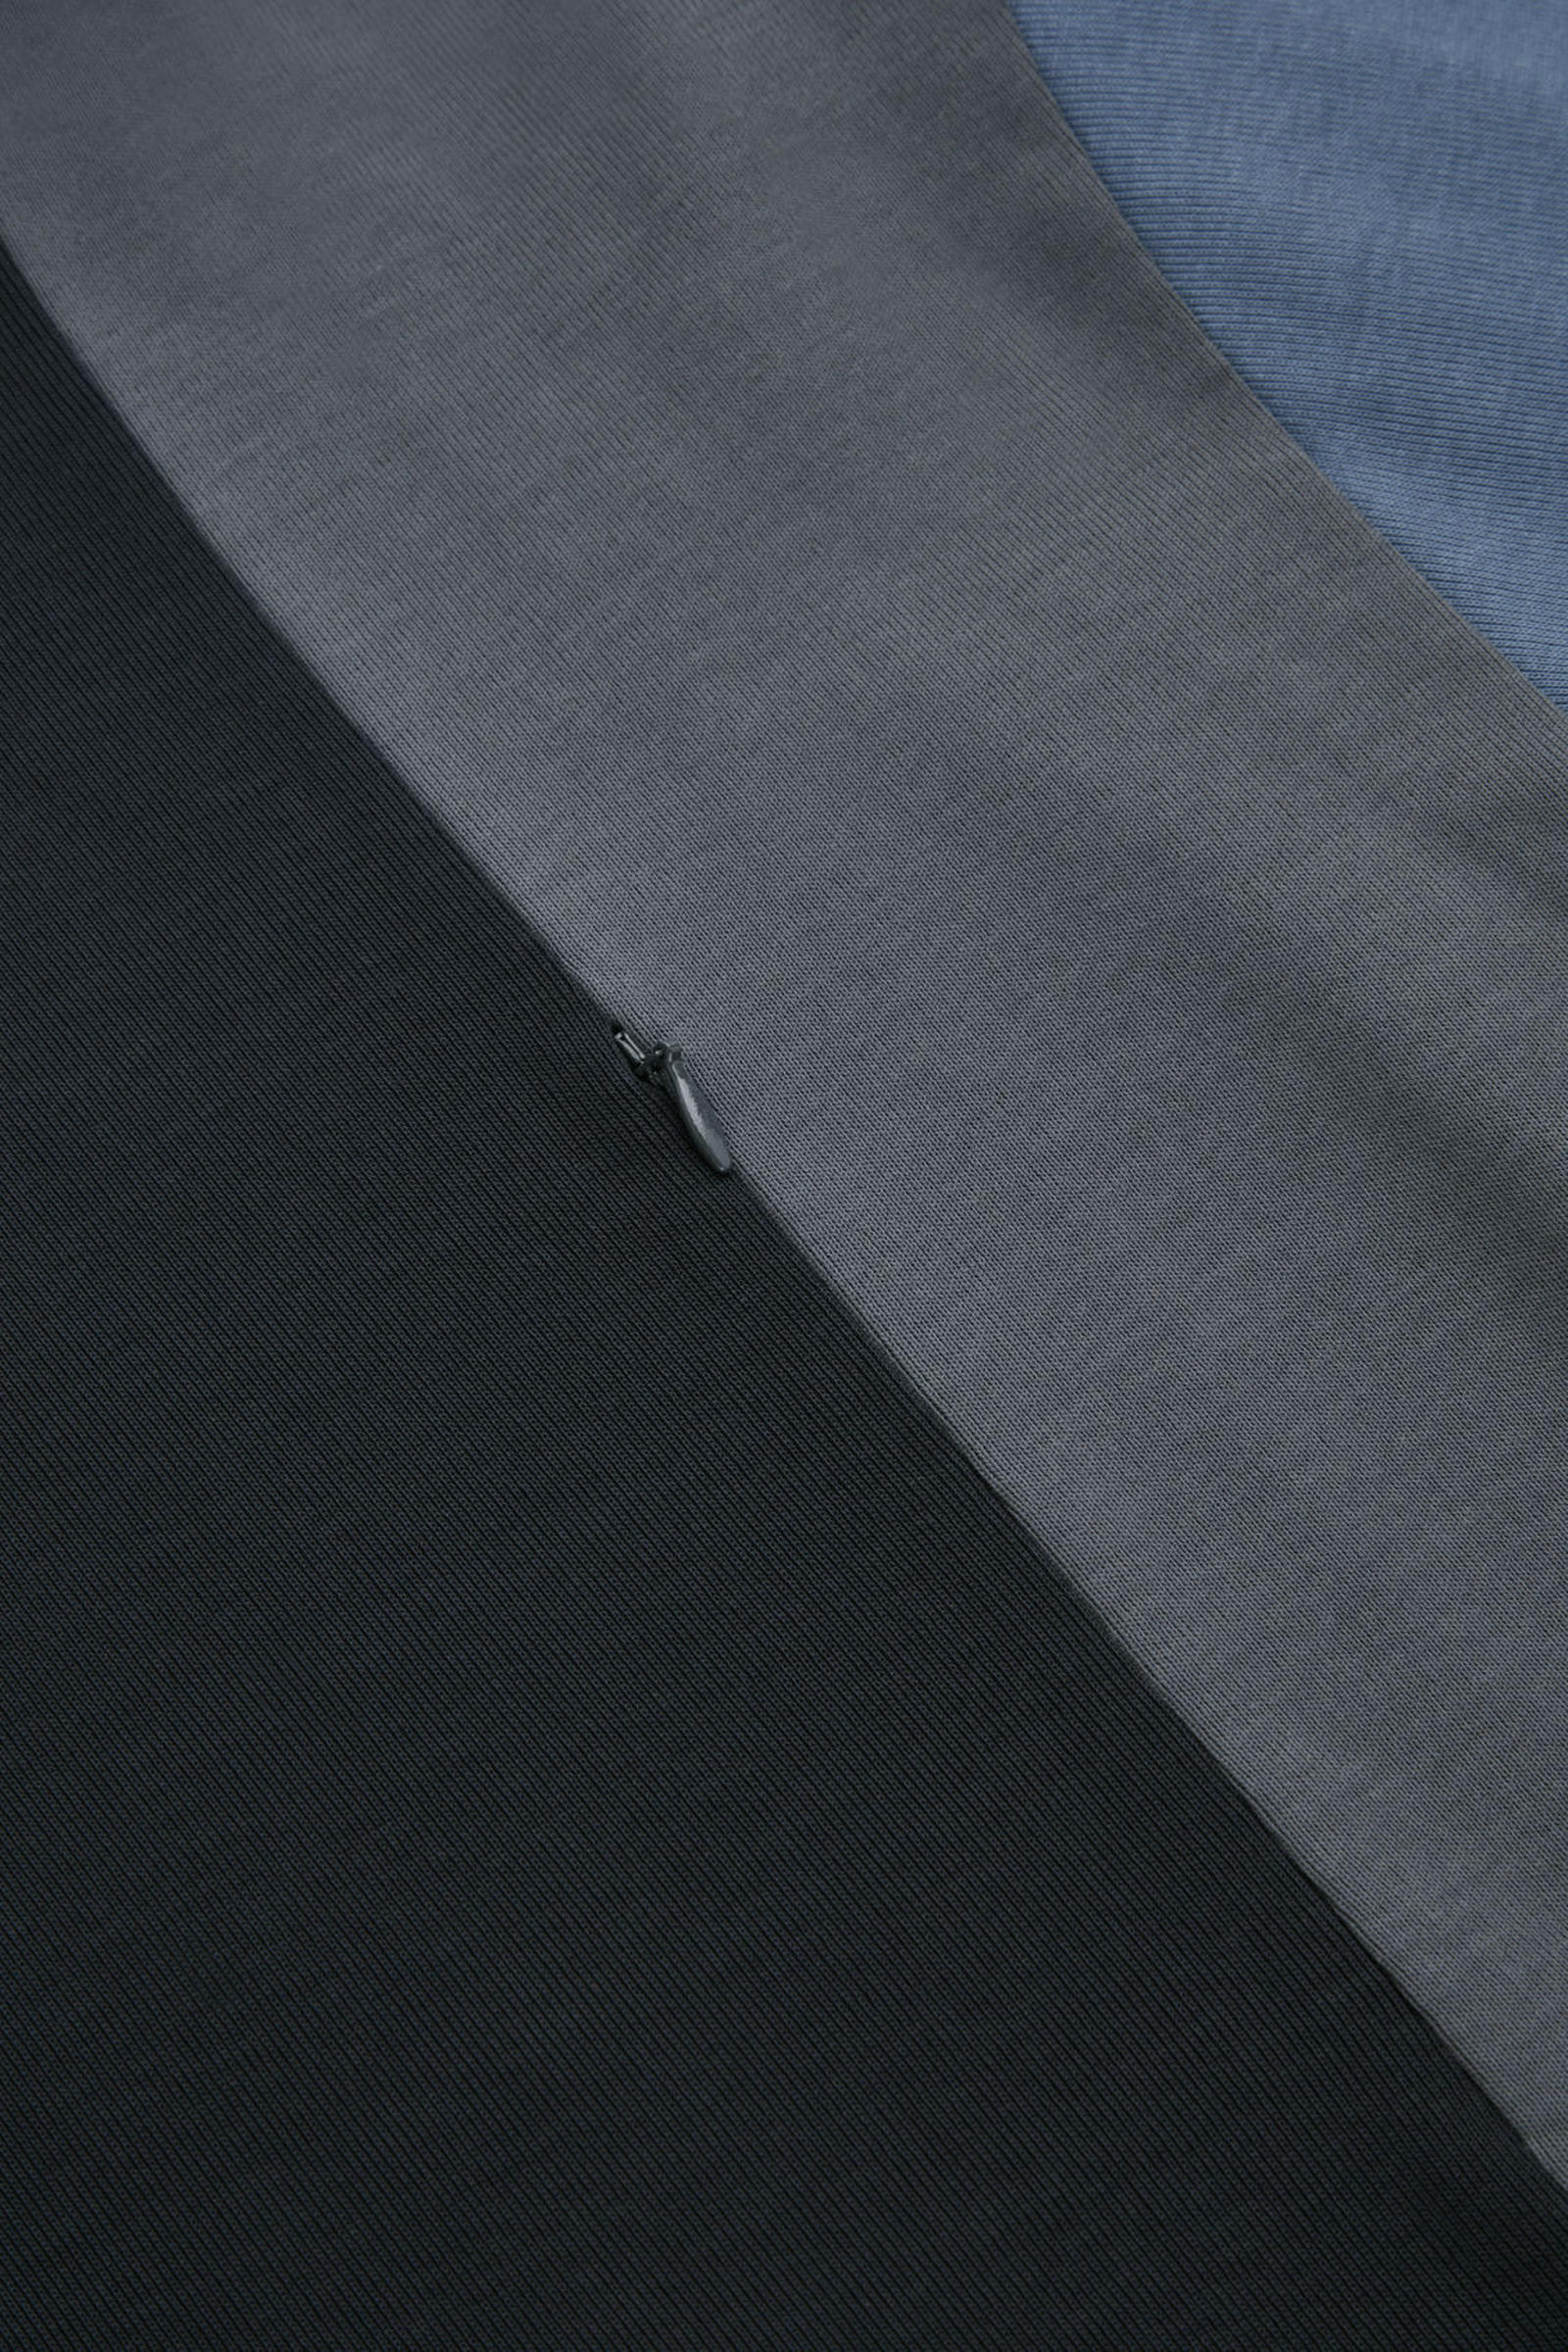 COS 코튼 패널드 티셔츠의 네이비 / 블루 / 그레이컬러 Detail입니다.